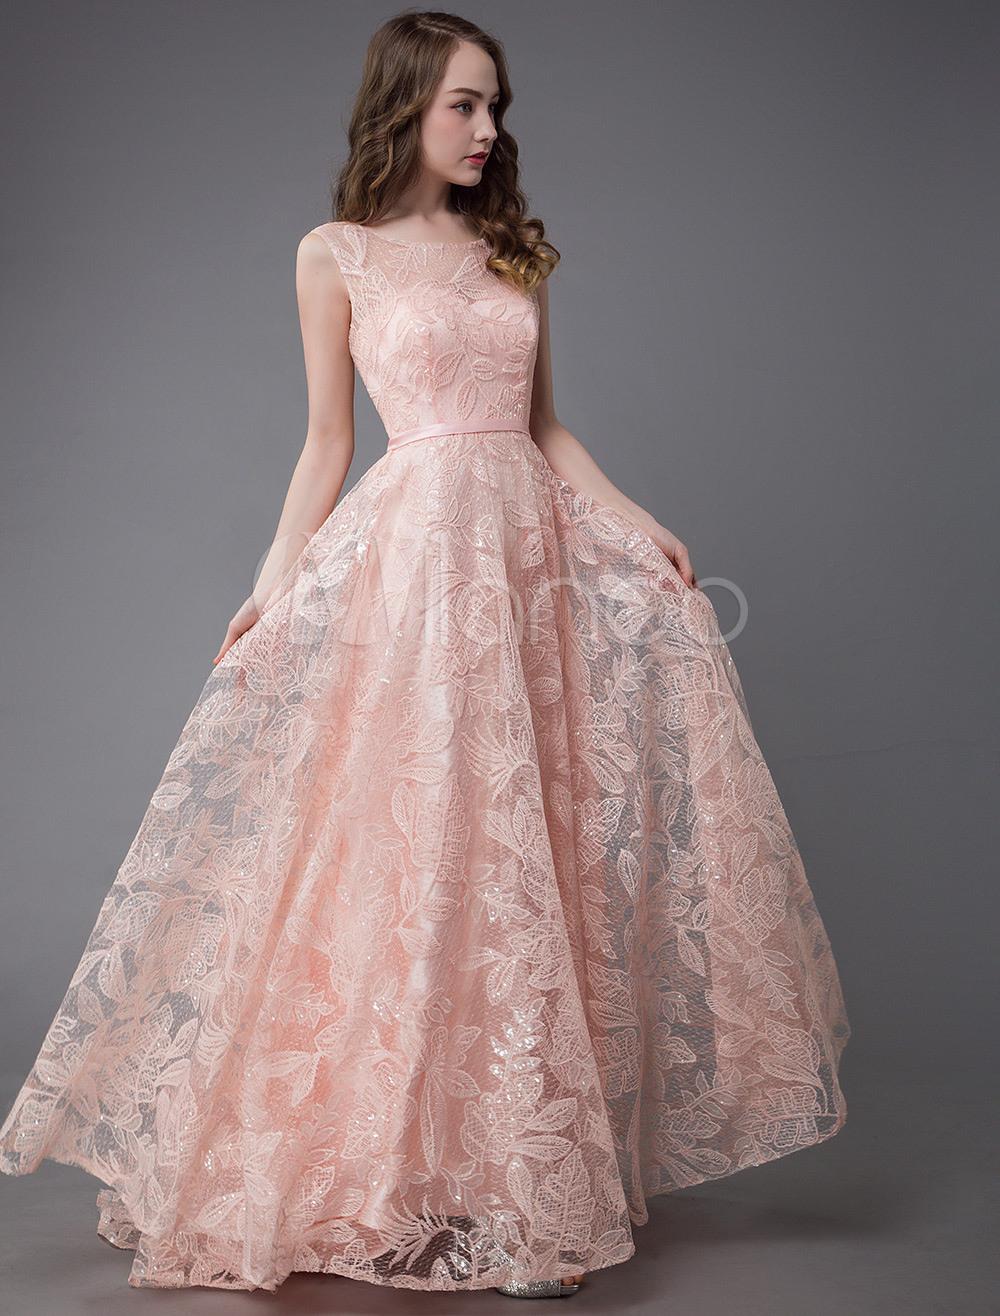 20 Großartig Rosa Abendkleid Galerie Wunderbar Rosa Abendkleid Ärmel